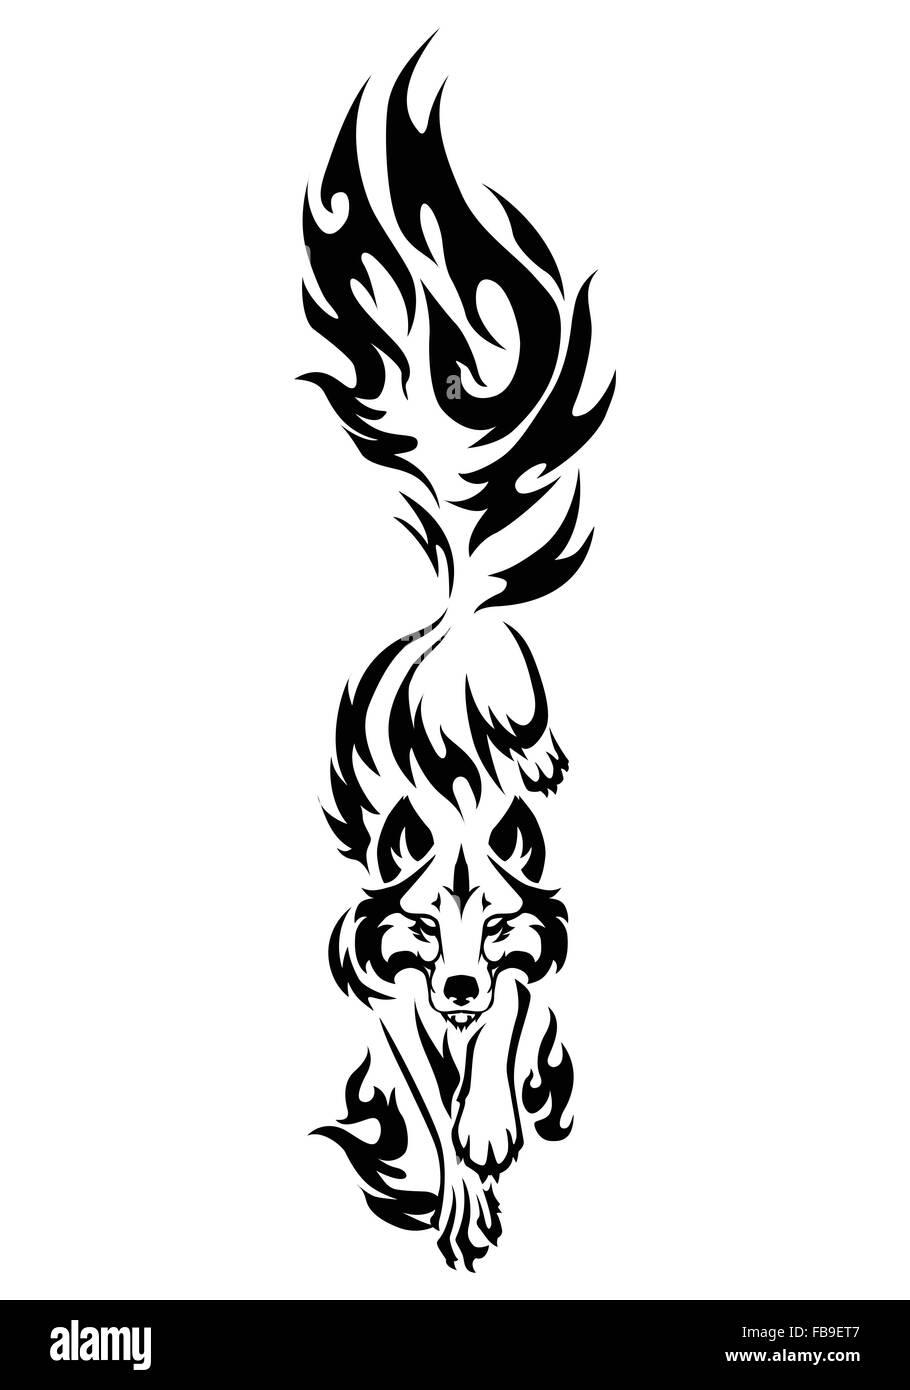 749c648459dd0 illustration of wolf black and white tattoo isolated on white background -  Stock Image